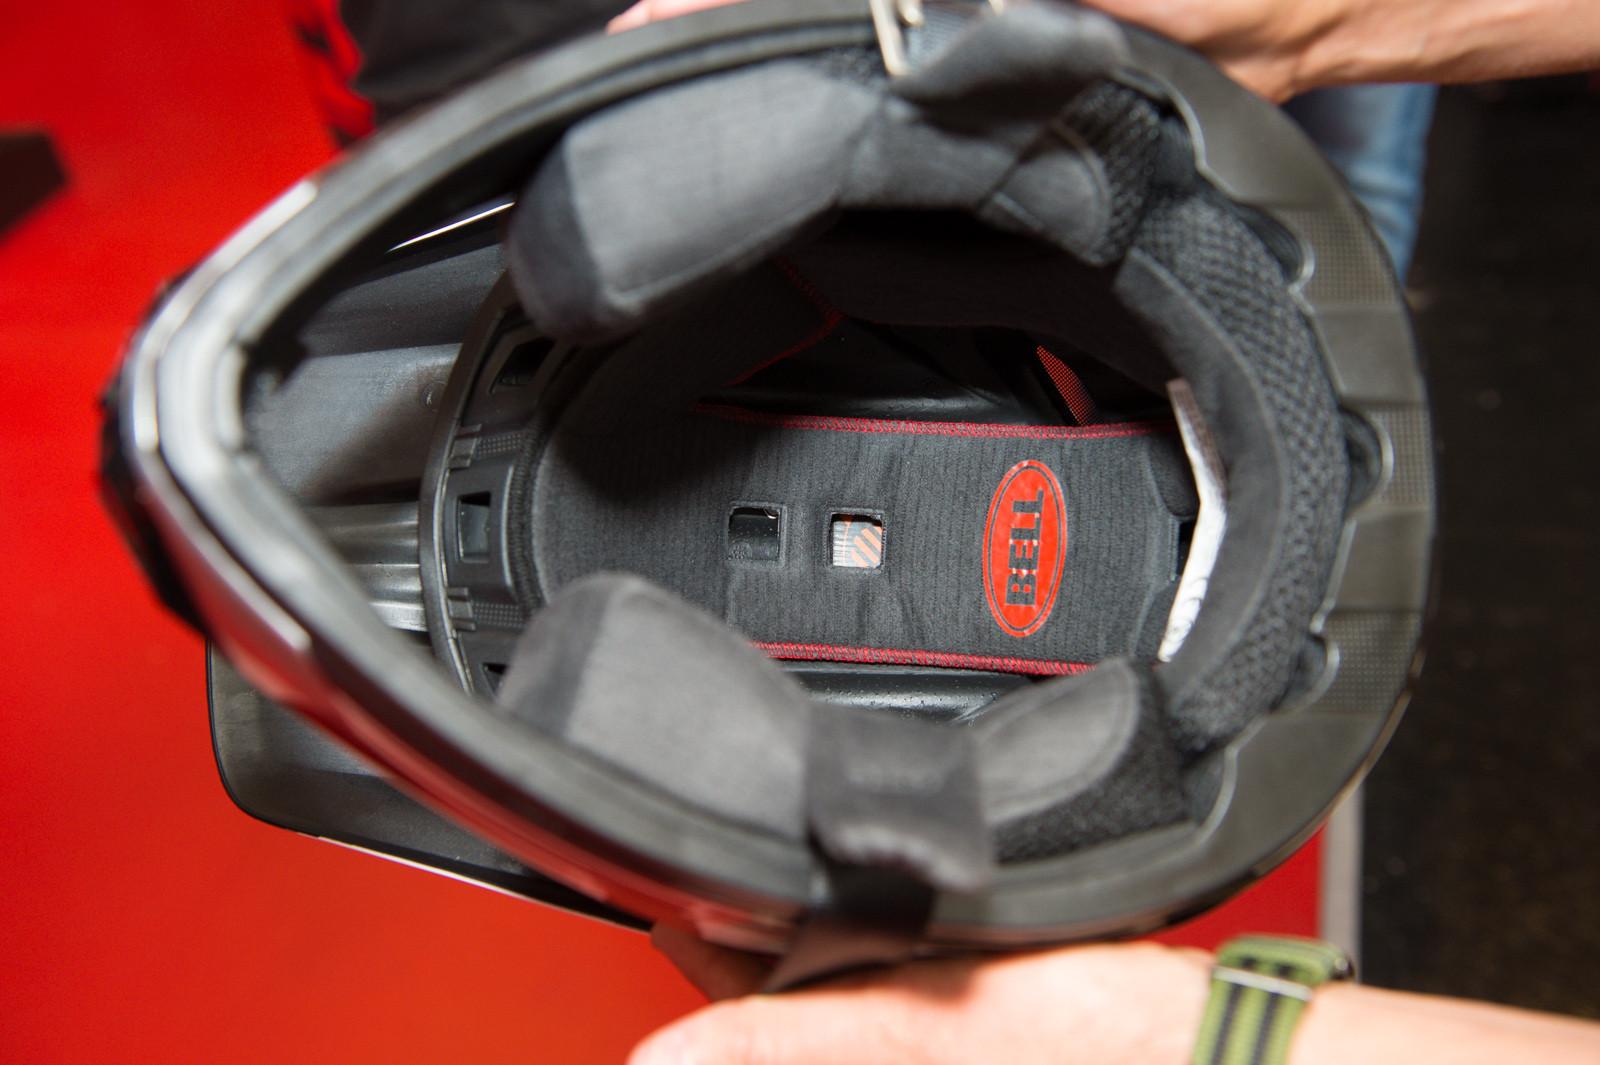 Bell Transfer-9 Full-Face Helmet - 2014 Mountain Bike Apparel & Protection at Eurobike 2013 - Mountain Biking Pictures - Vital MTB